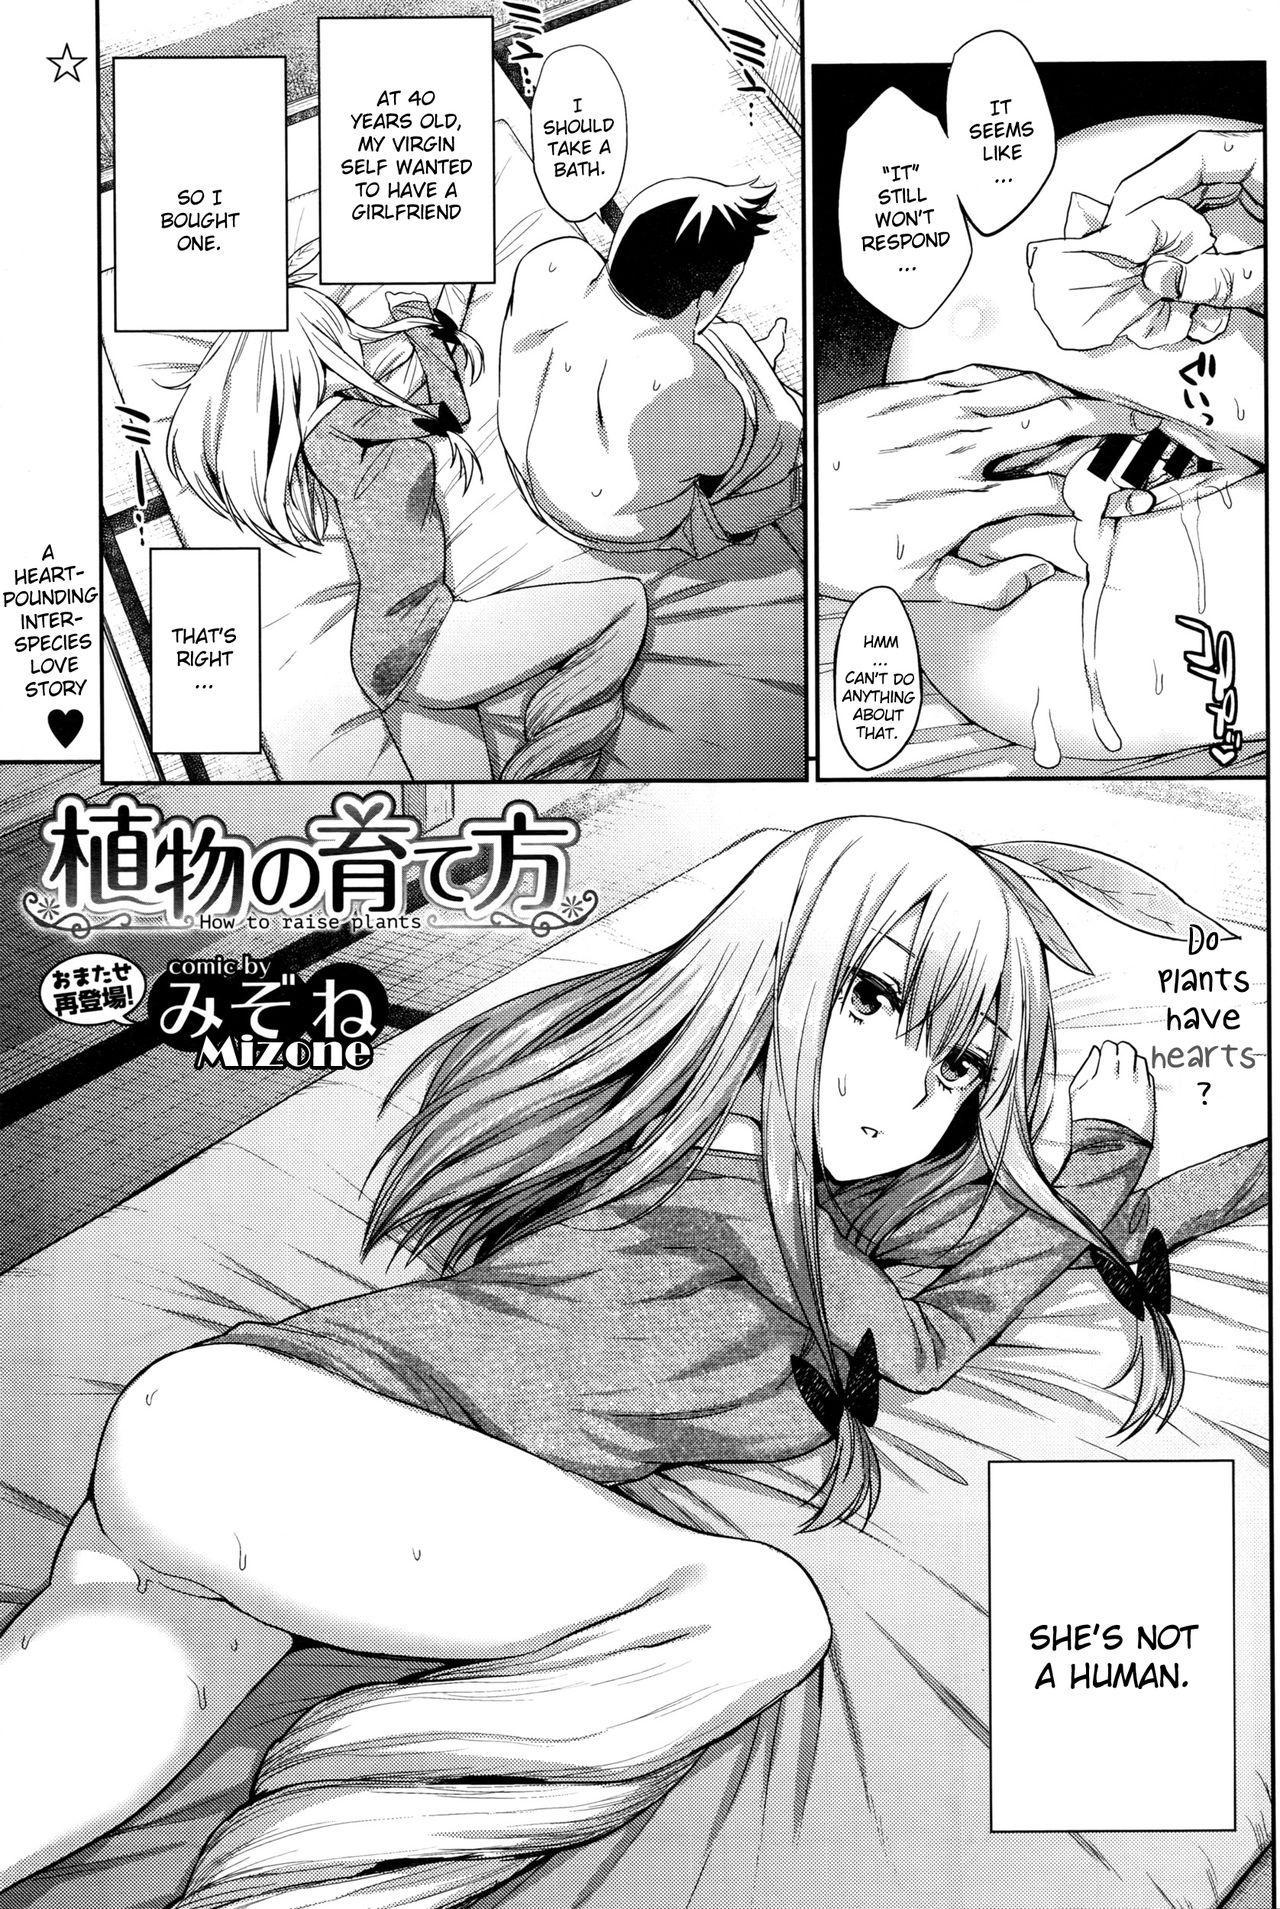 [Mizone] Shokubutsu no Sodatekata - How to raise plants (COMIC BAVEL 2016-04) [English] [InsanePraetor+4chanH] 2